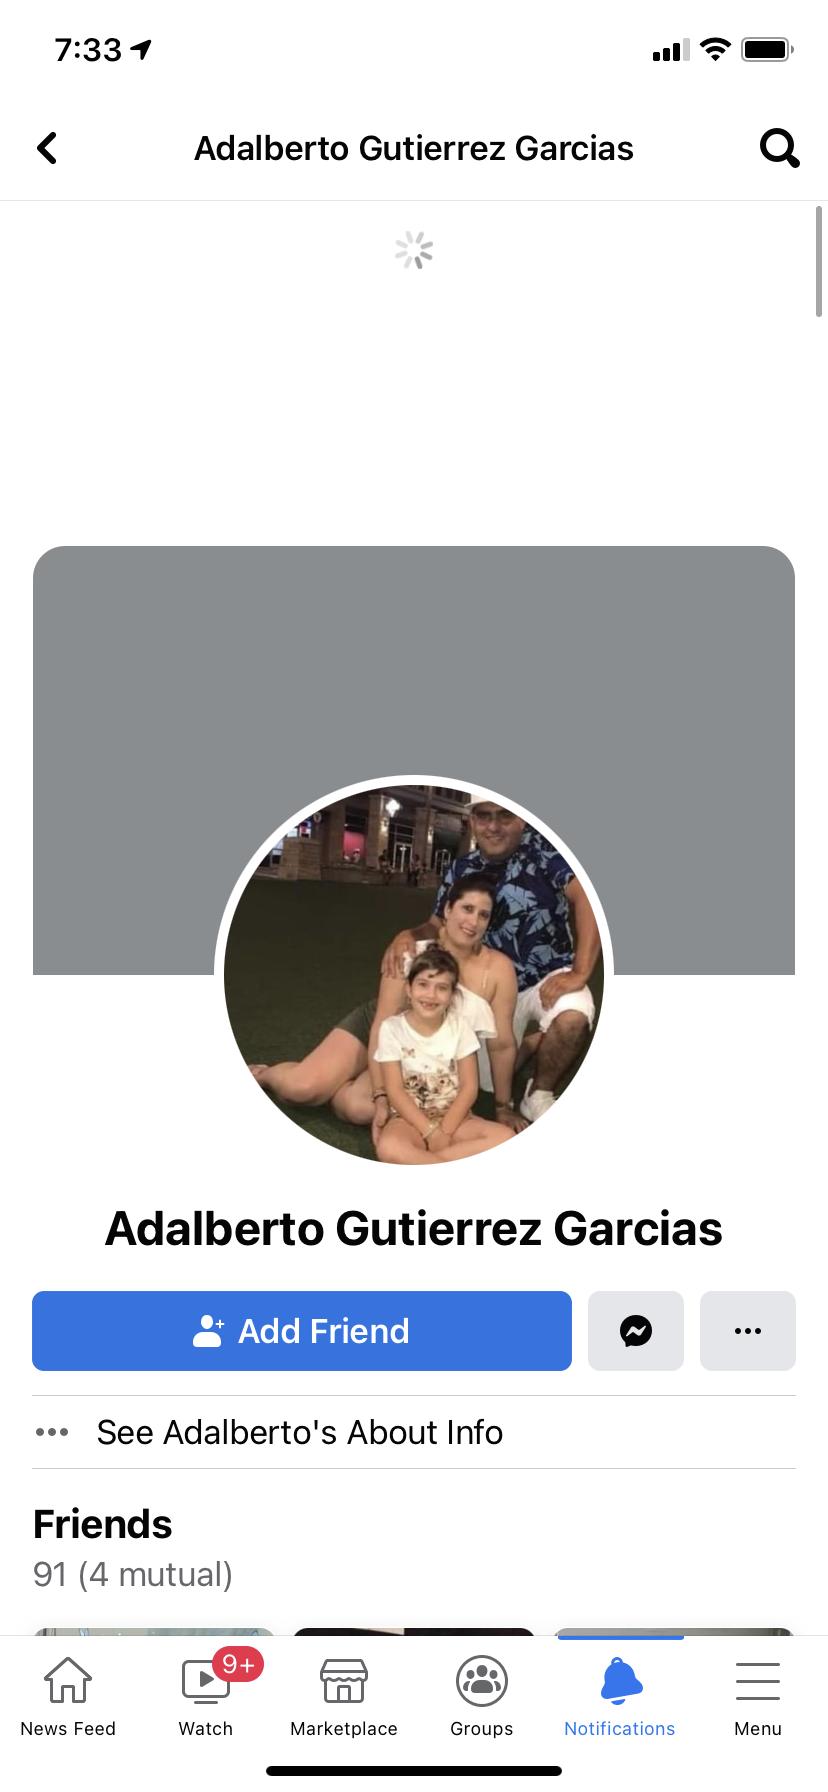 Adalberto Gutiérrez garcia